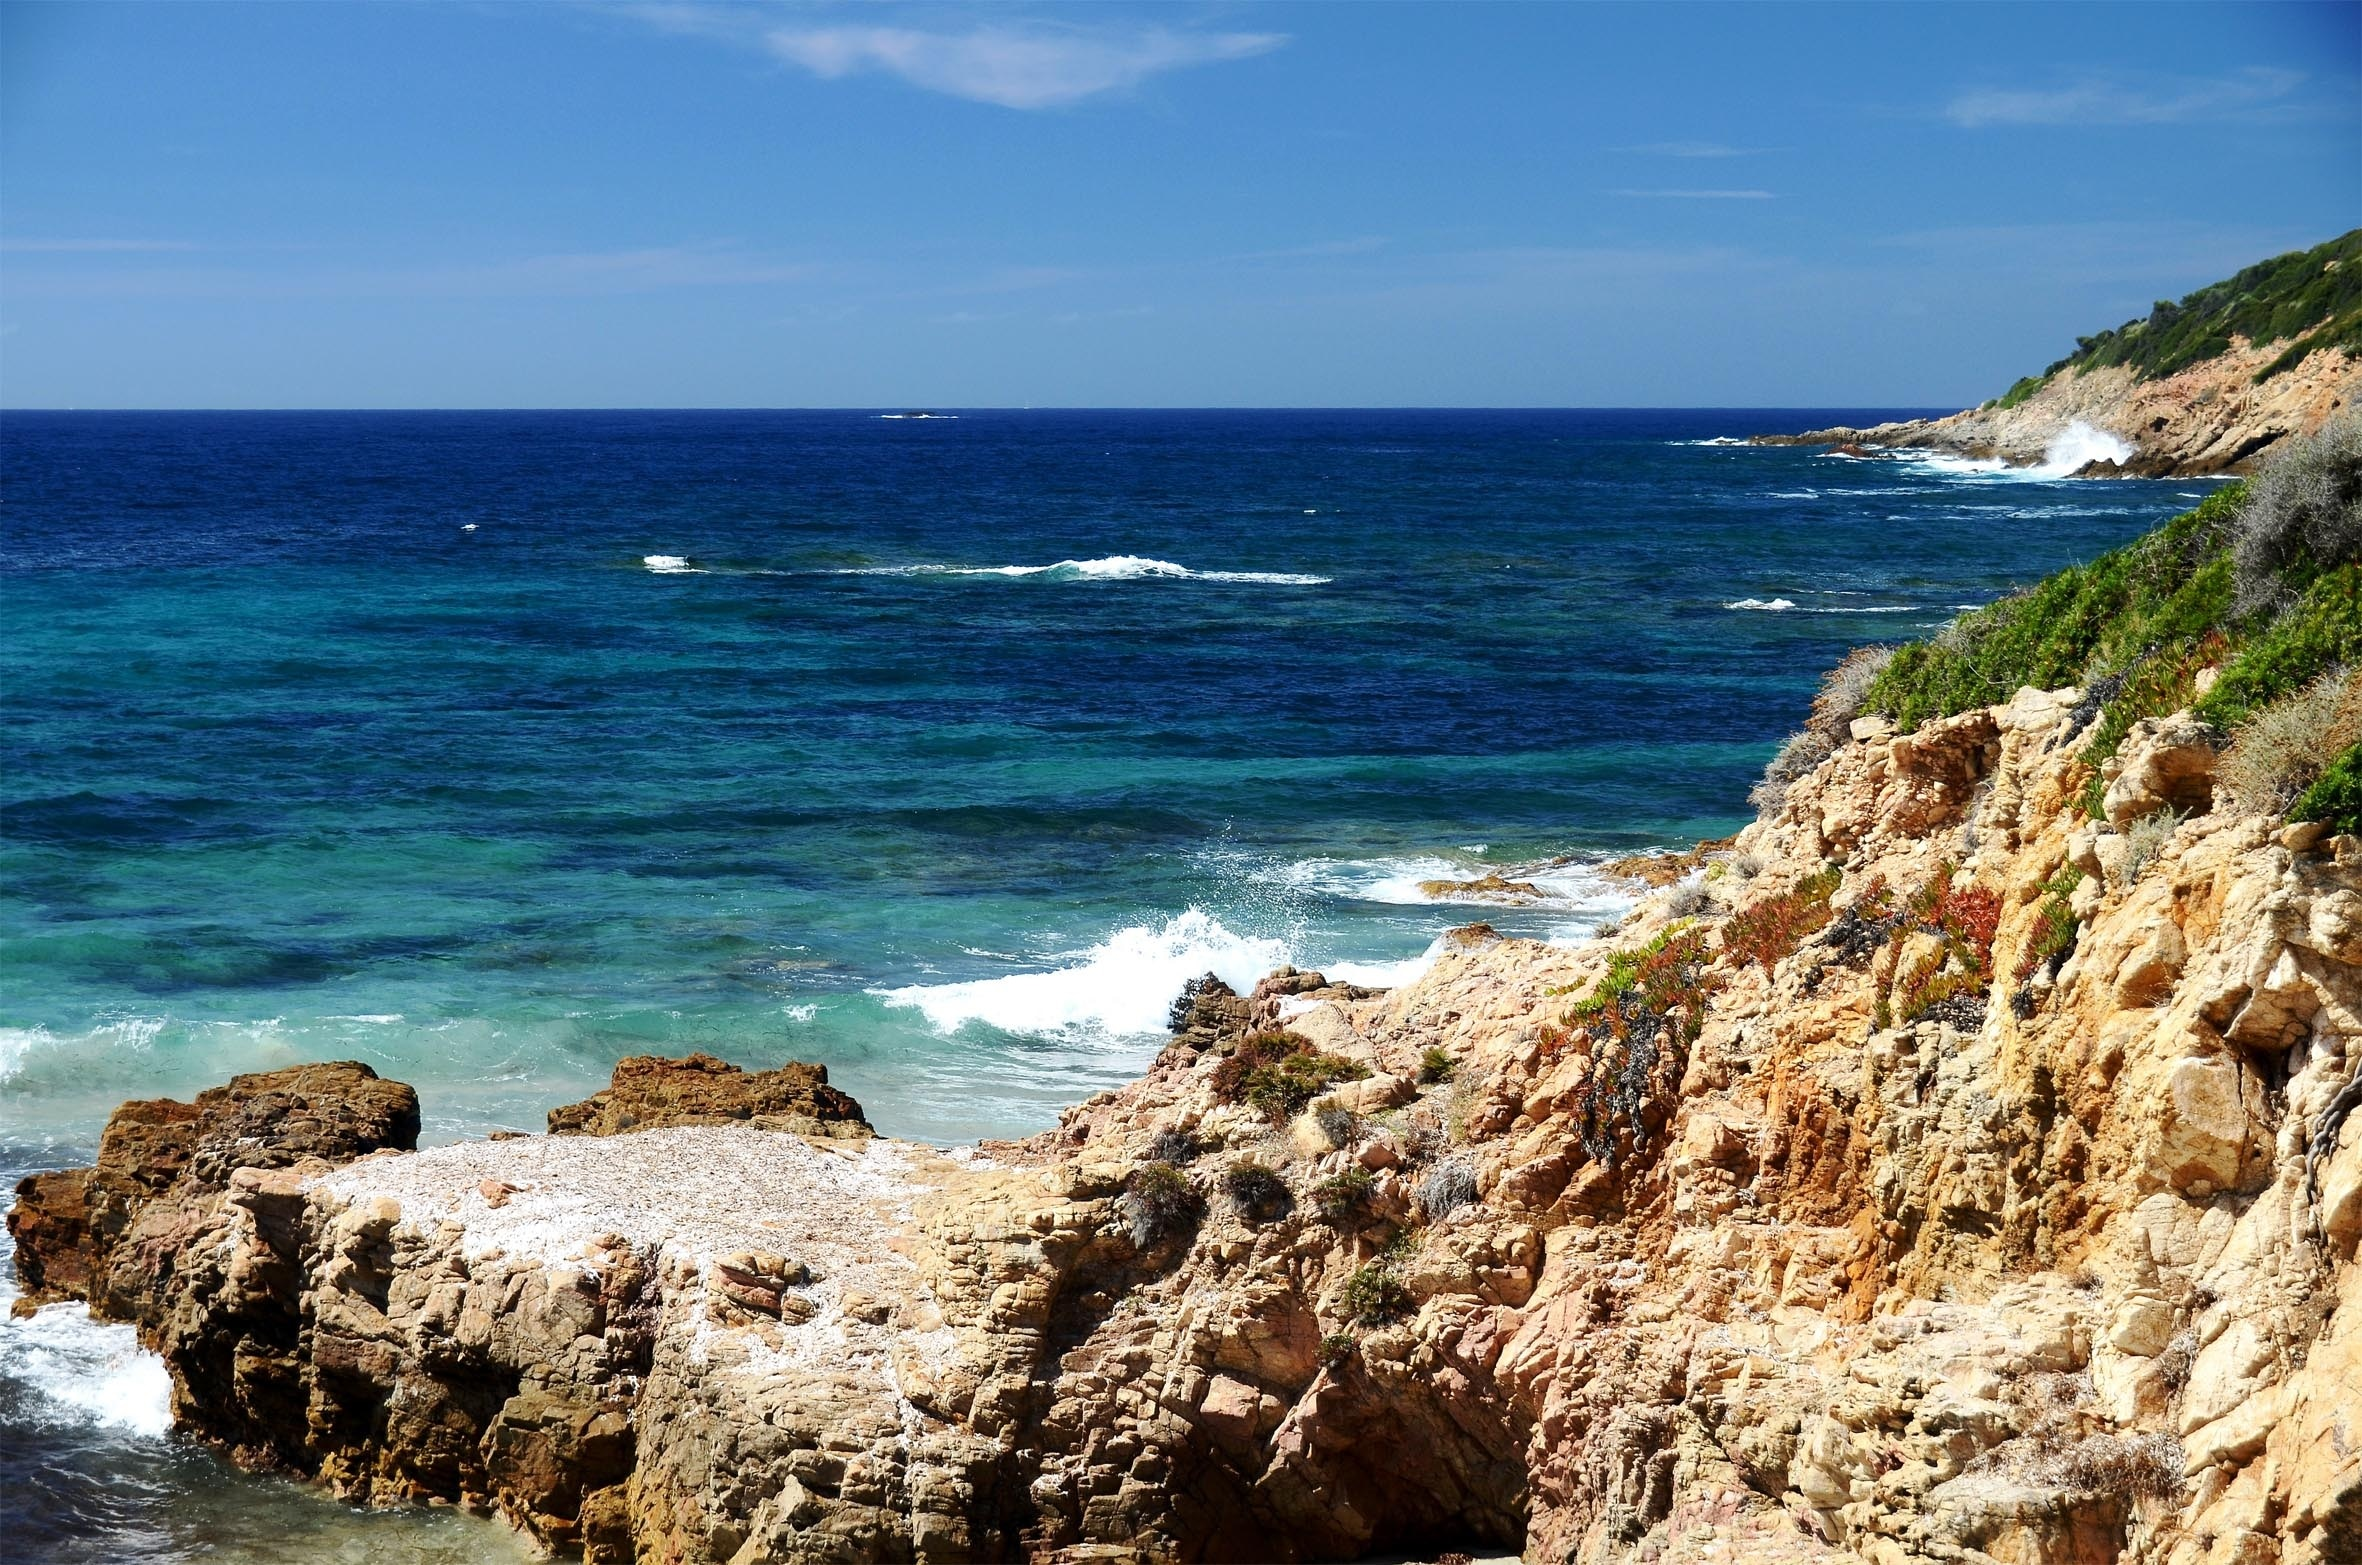 Southern Corsica Beaches, Corse-du-Sud, France